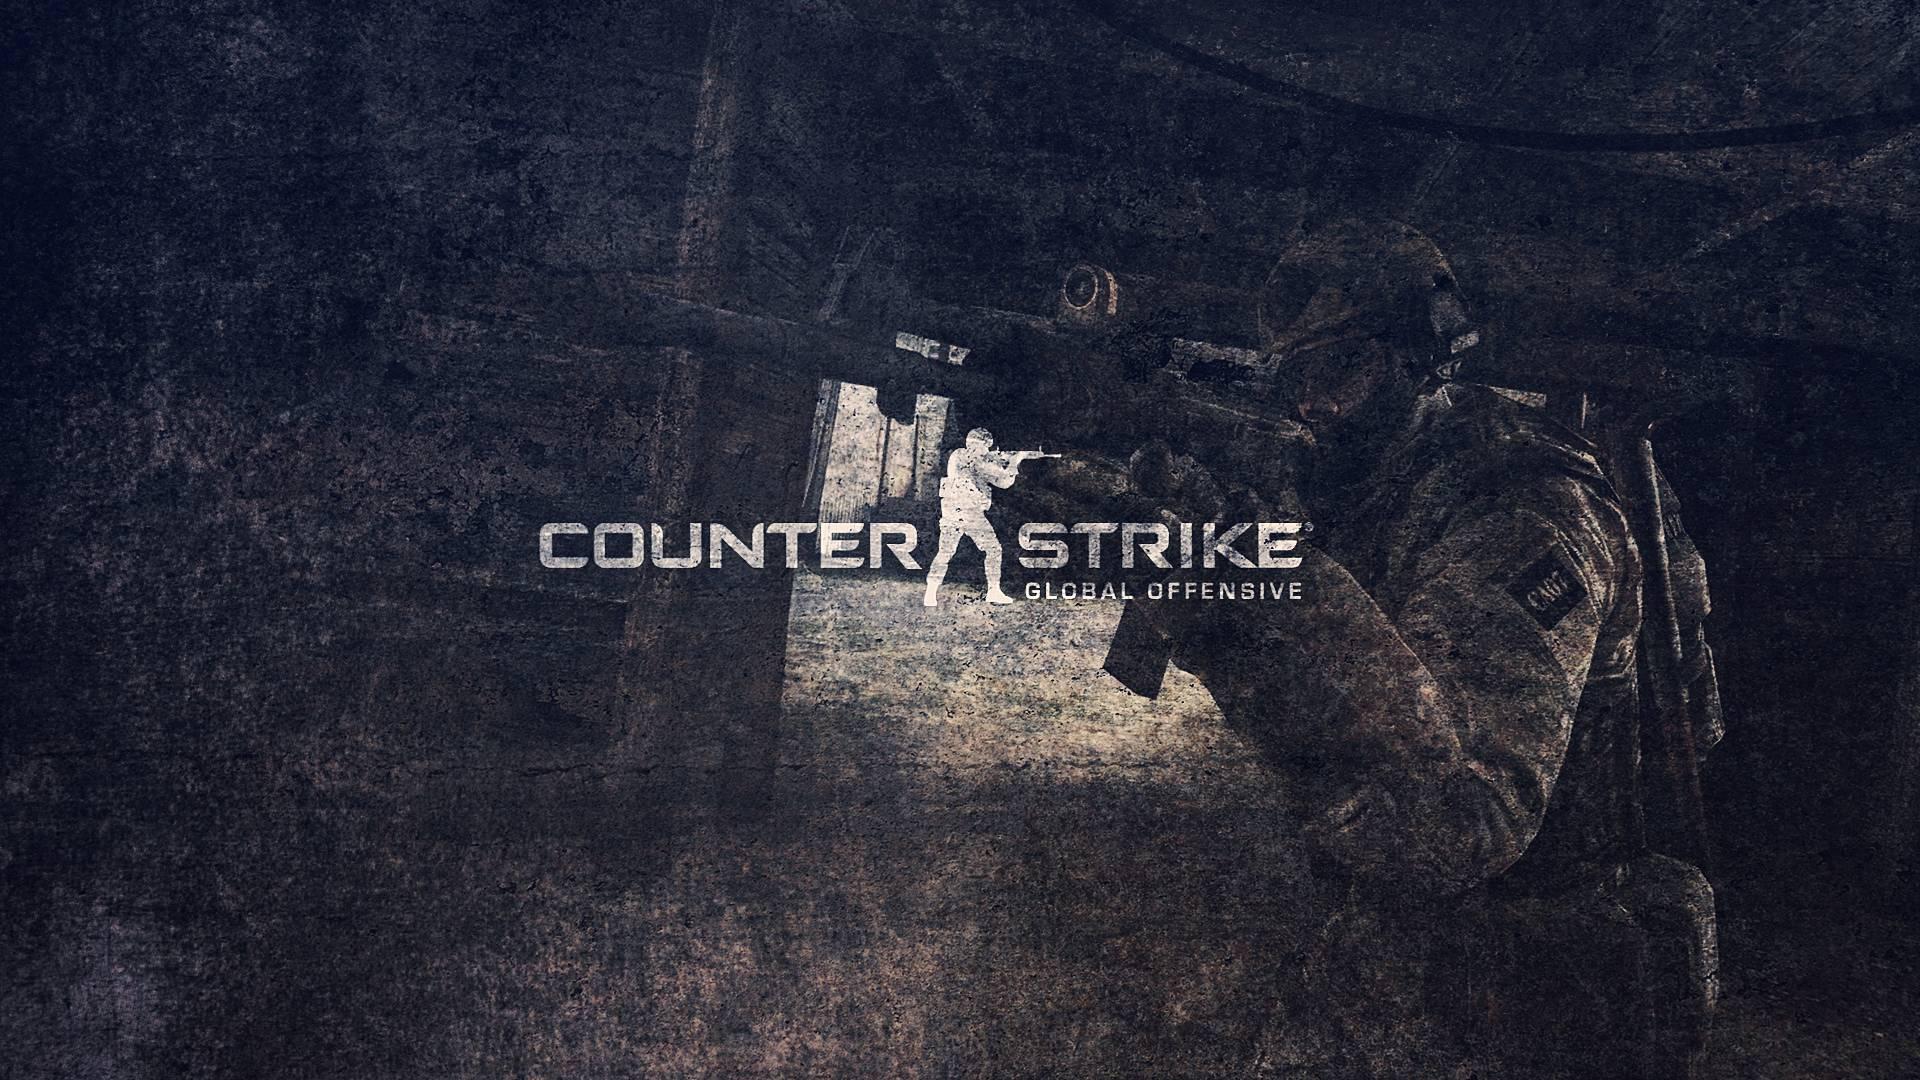 Counter-Strike: Global Offensive HD